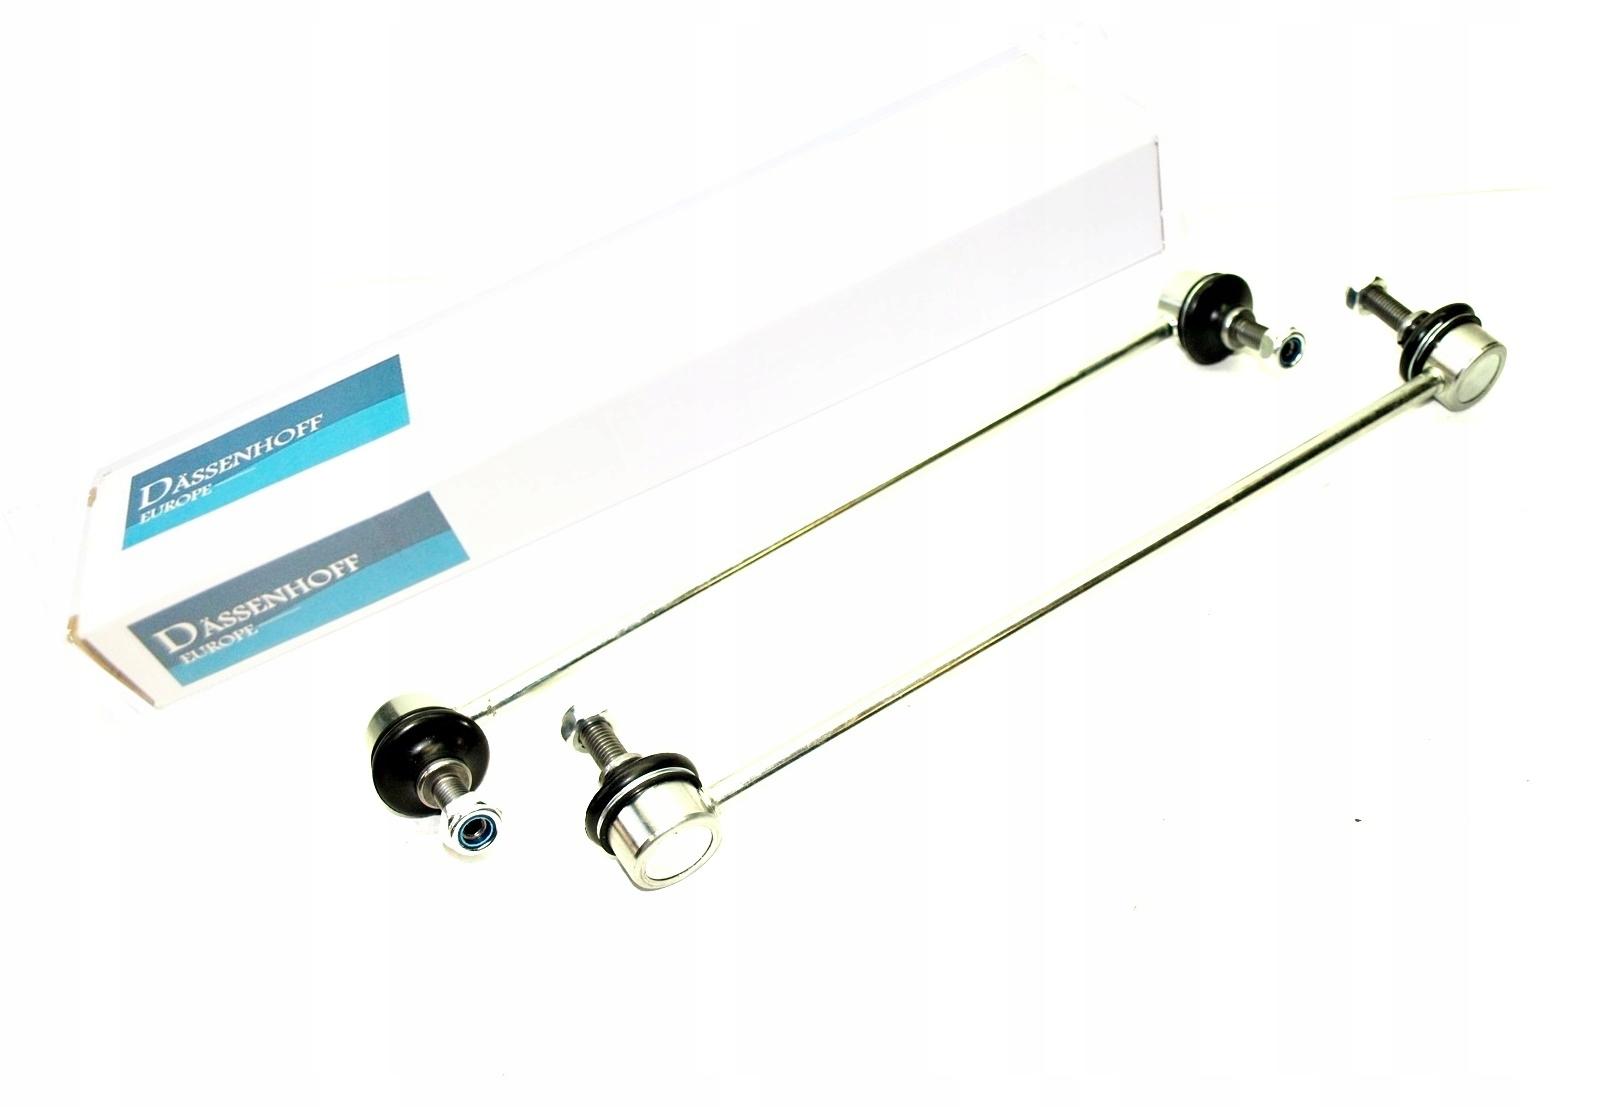 2x Соединитель стабилизатора вперед peugeot 206 c2 c3